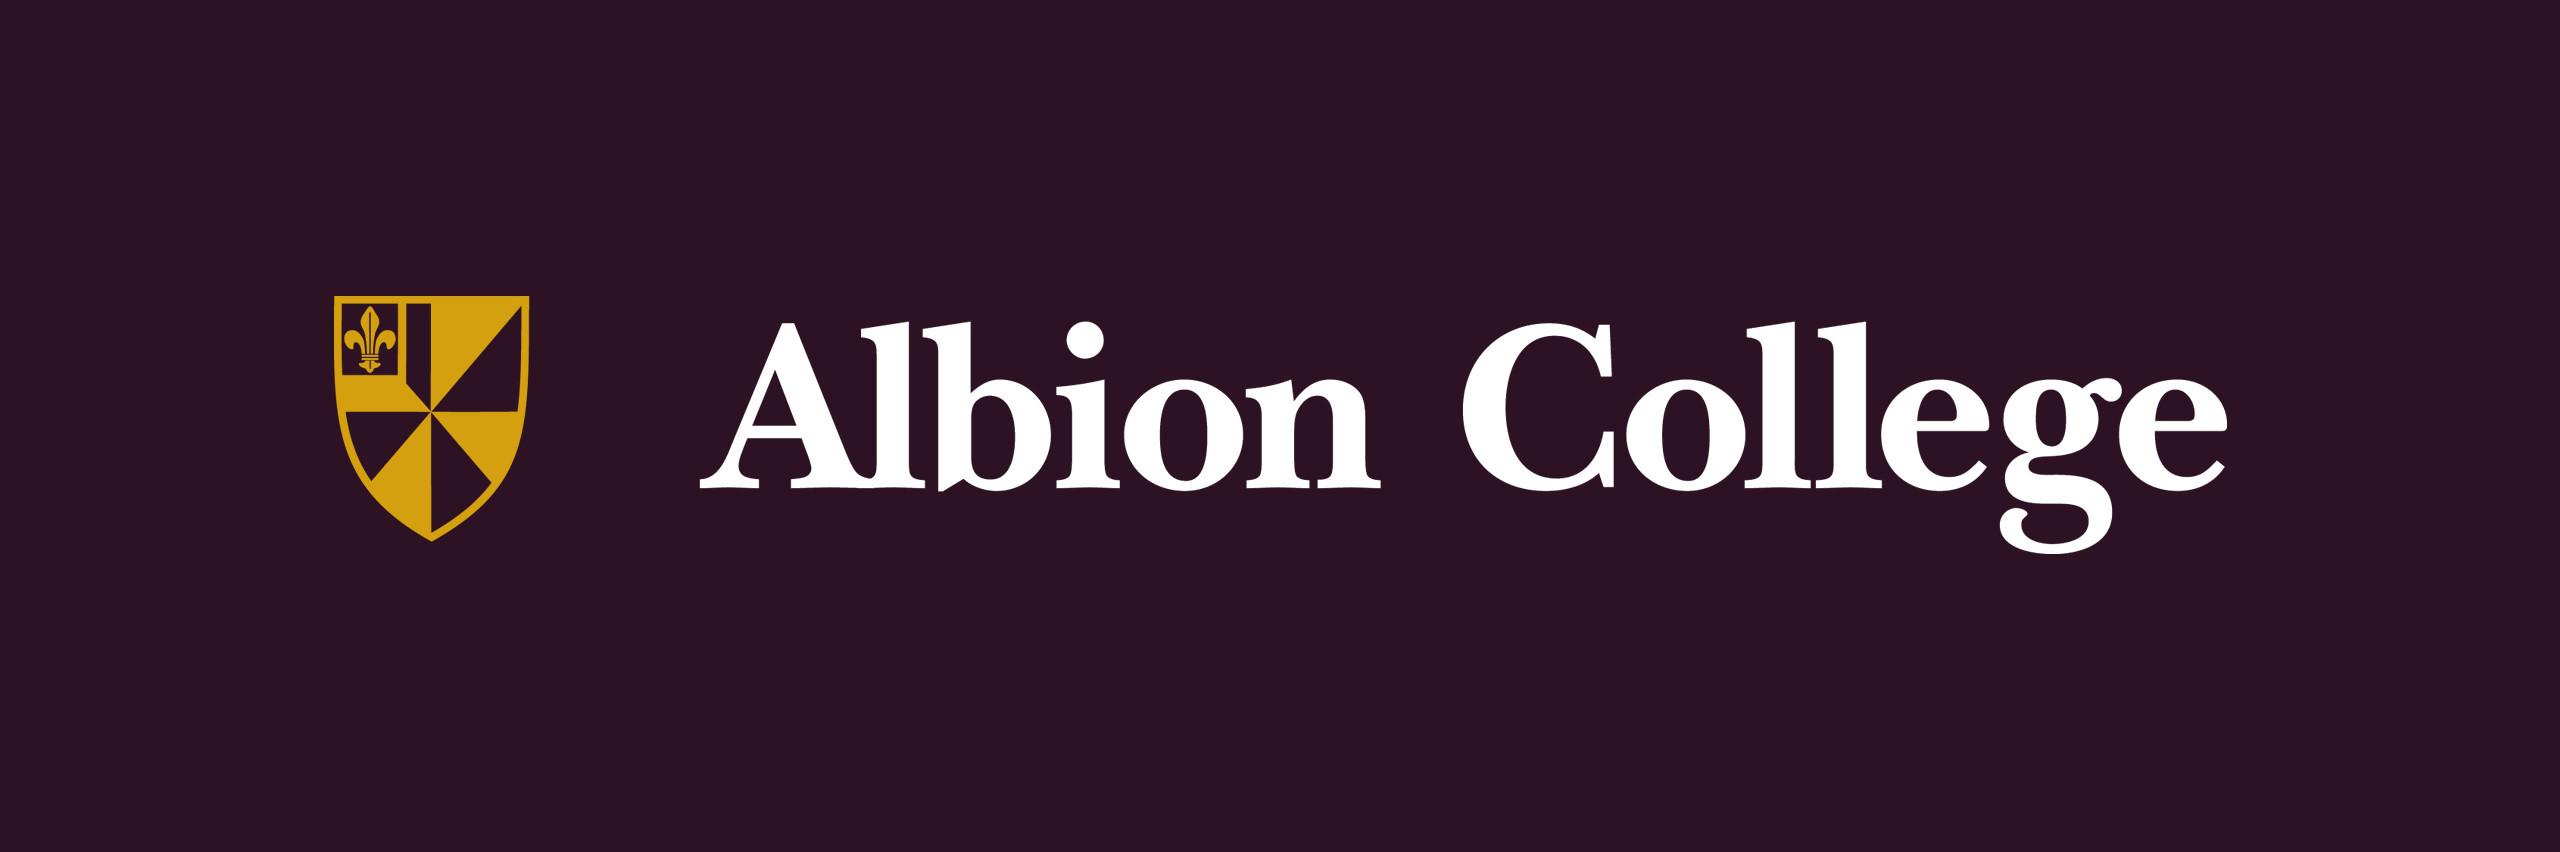 AlbionCollege